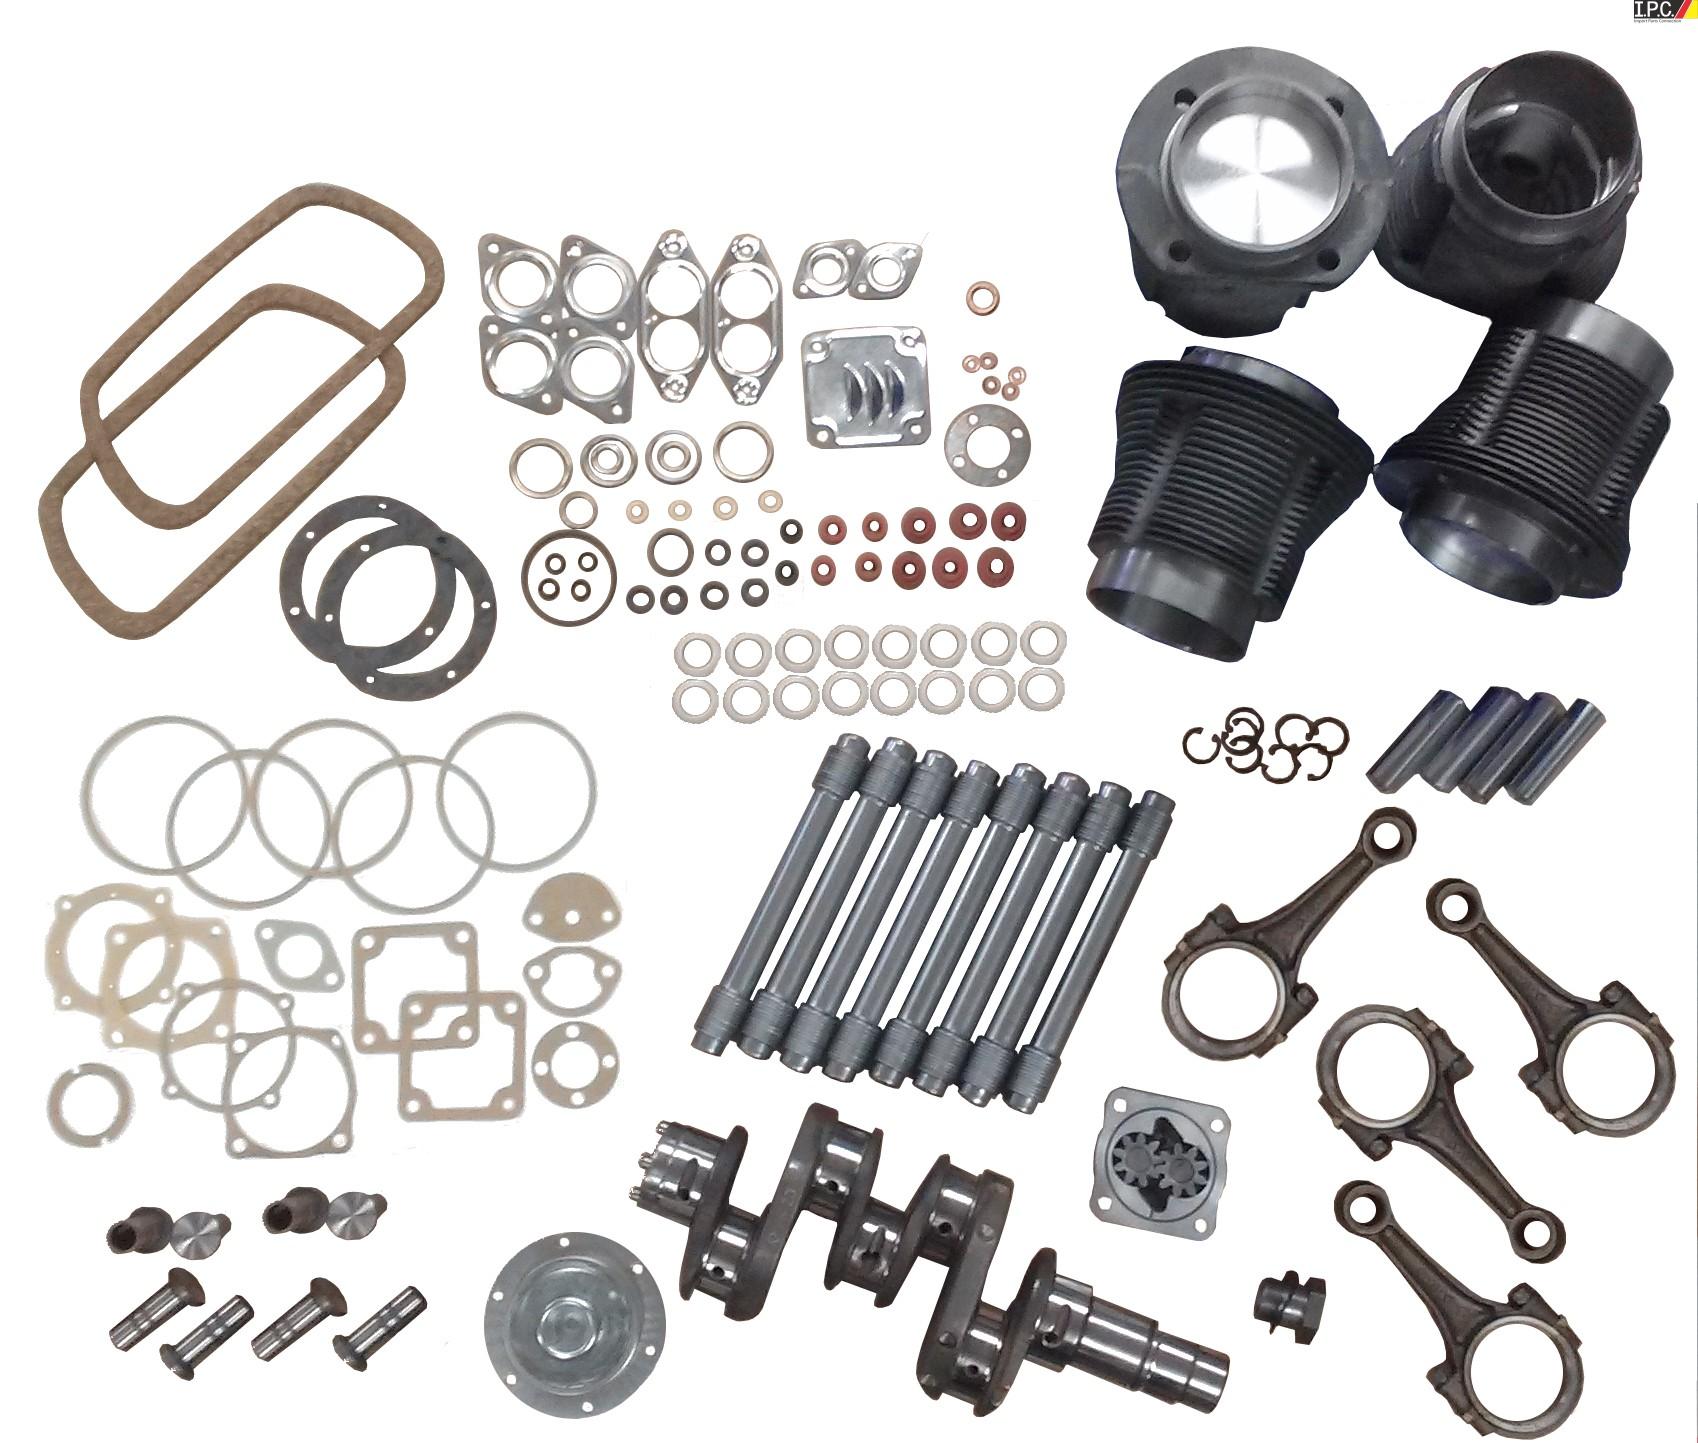 Engine Rebuild Kit For 1776cc Engines  I P C  Vw Parts  Vw